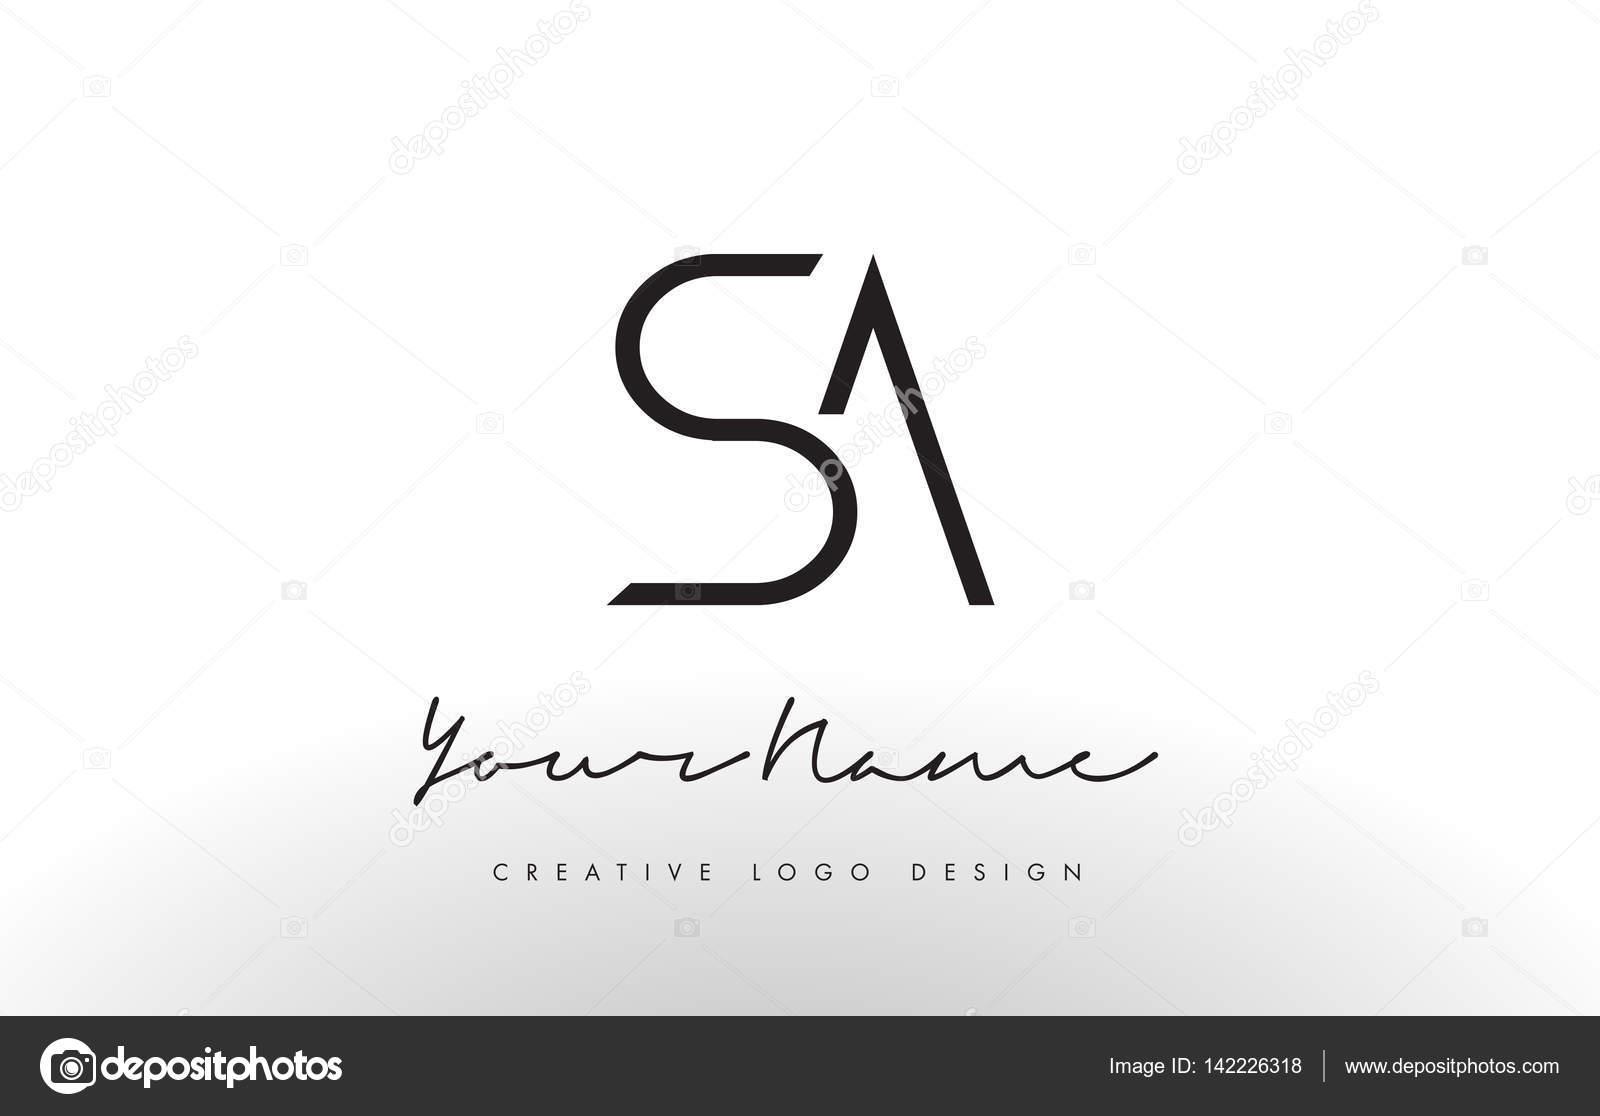 Sa Letters Logo Design Slim Creative Simple Black Letter